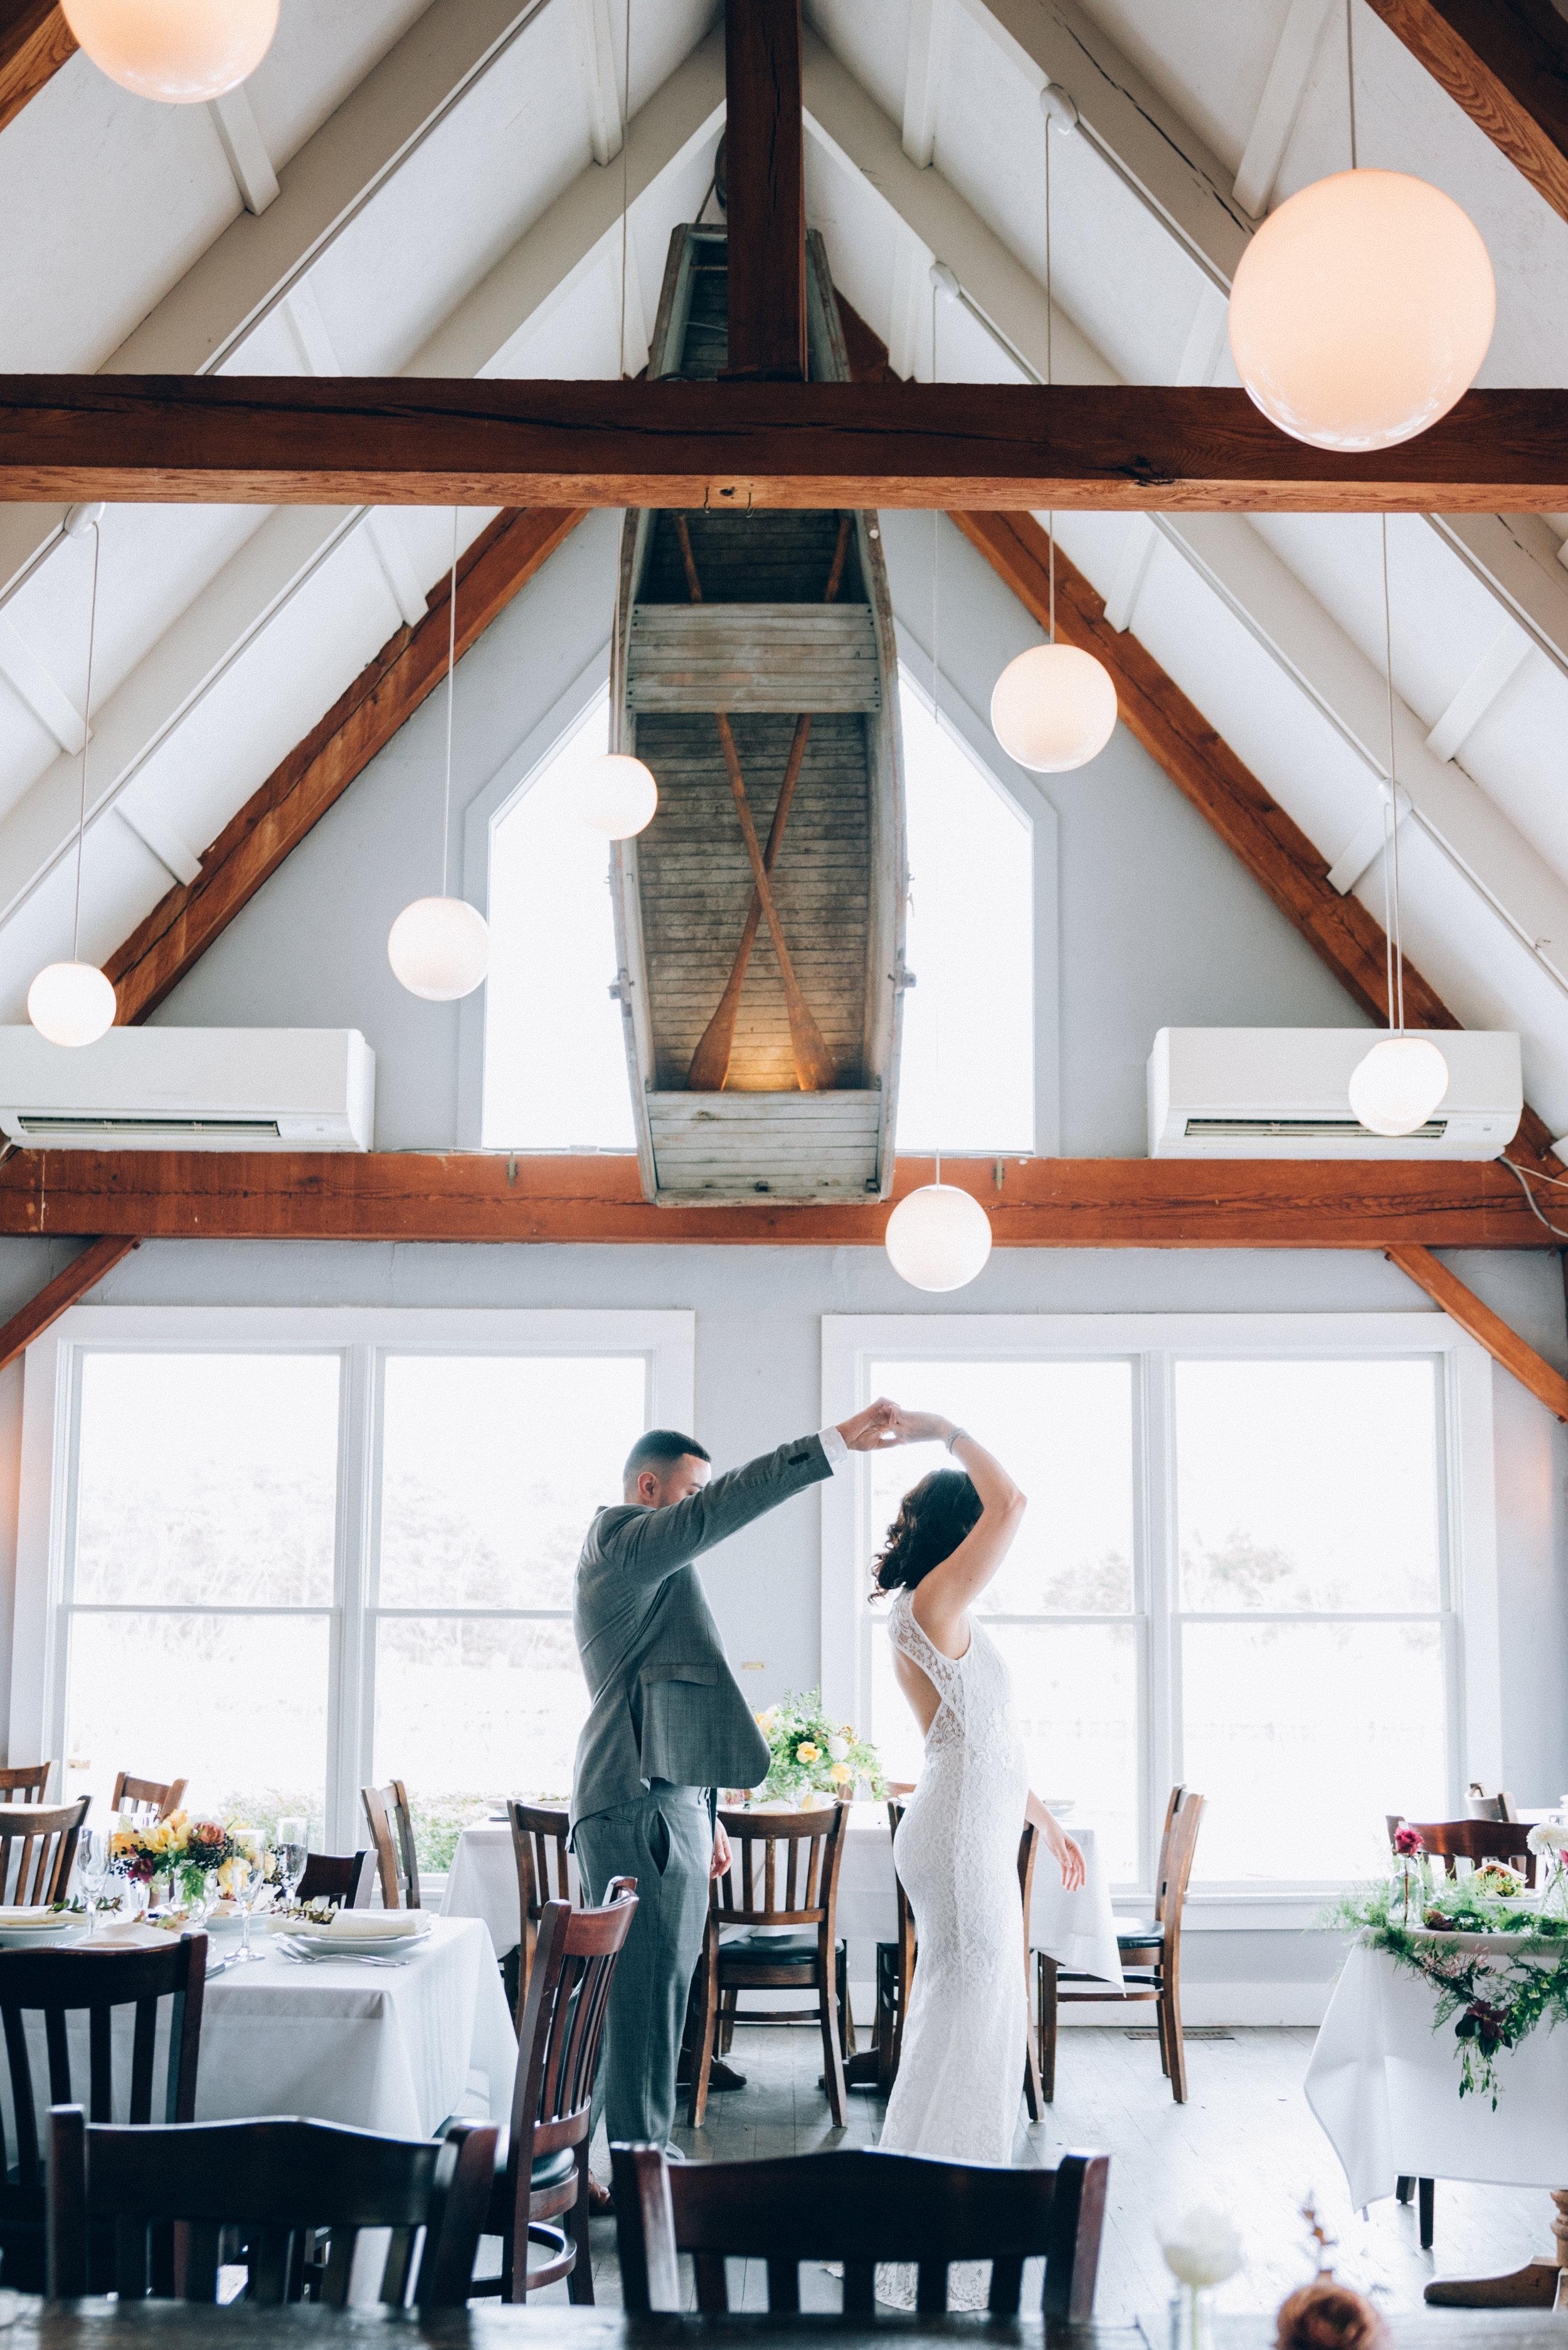 cowfish hampton bays wedding